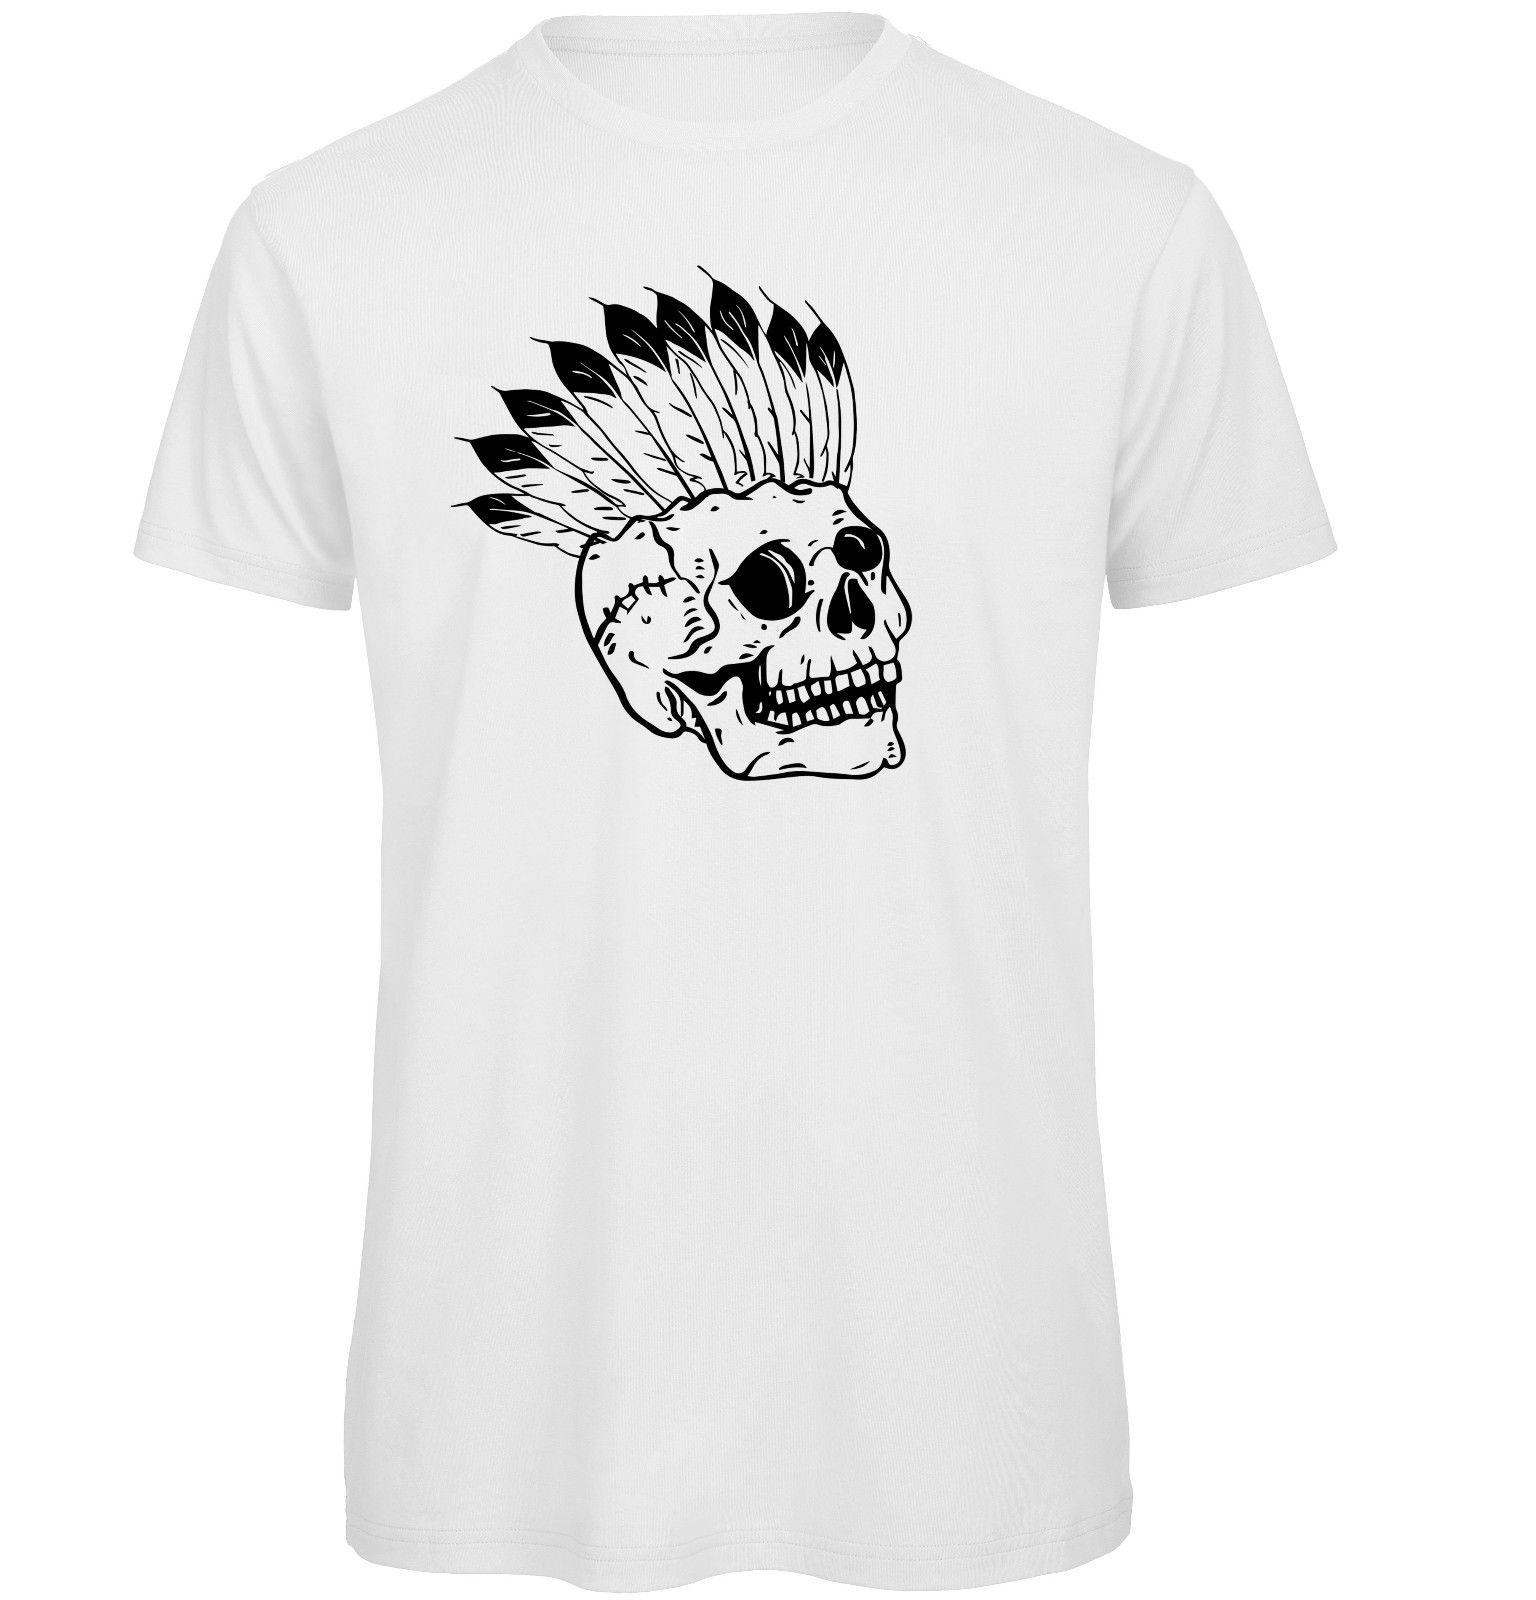 e4f292632835 High Quality Custom Printed Stitched Up Mohawk Skull Organic T Shirt 100%  Cotton Casual Printing Short Sleeve Men T Shirt O Neck Designer White Tee  Shirts ...